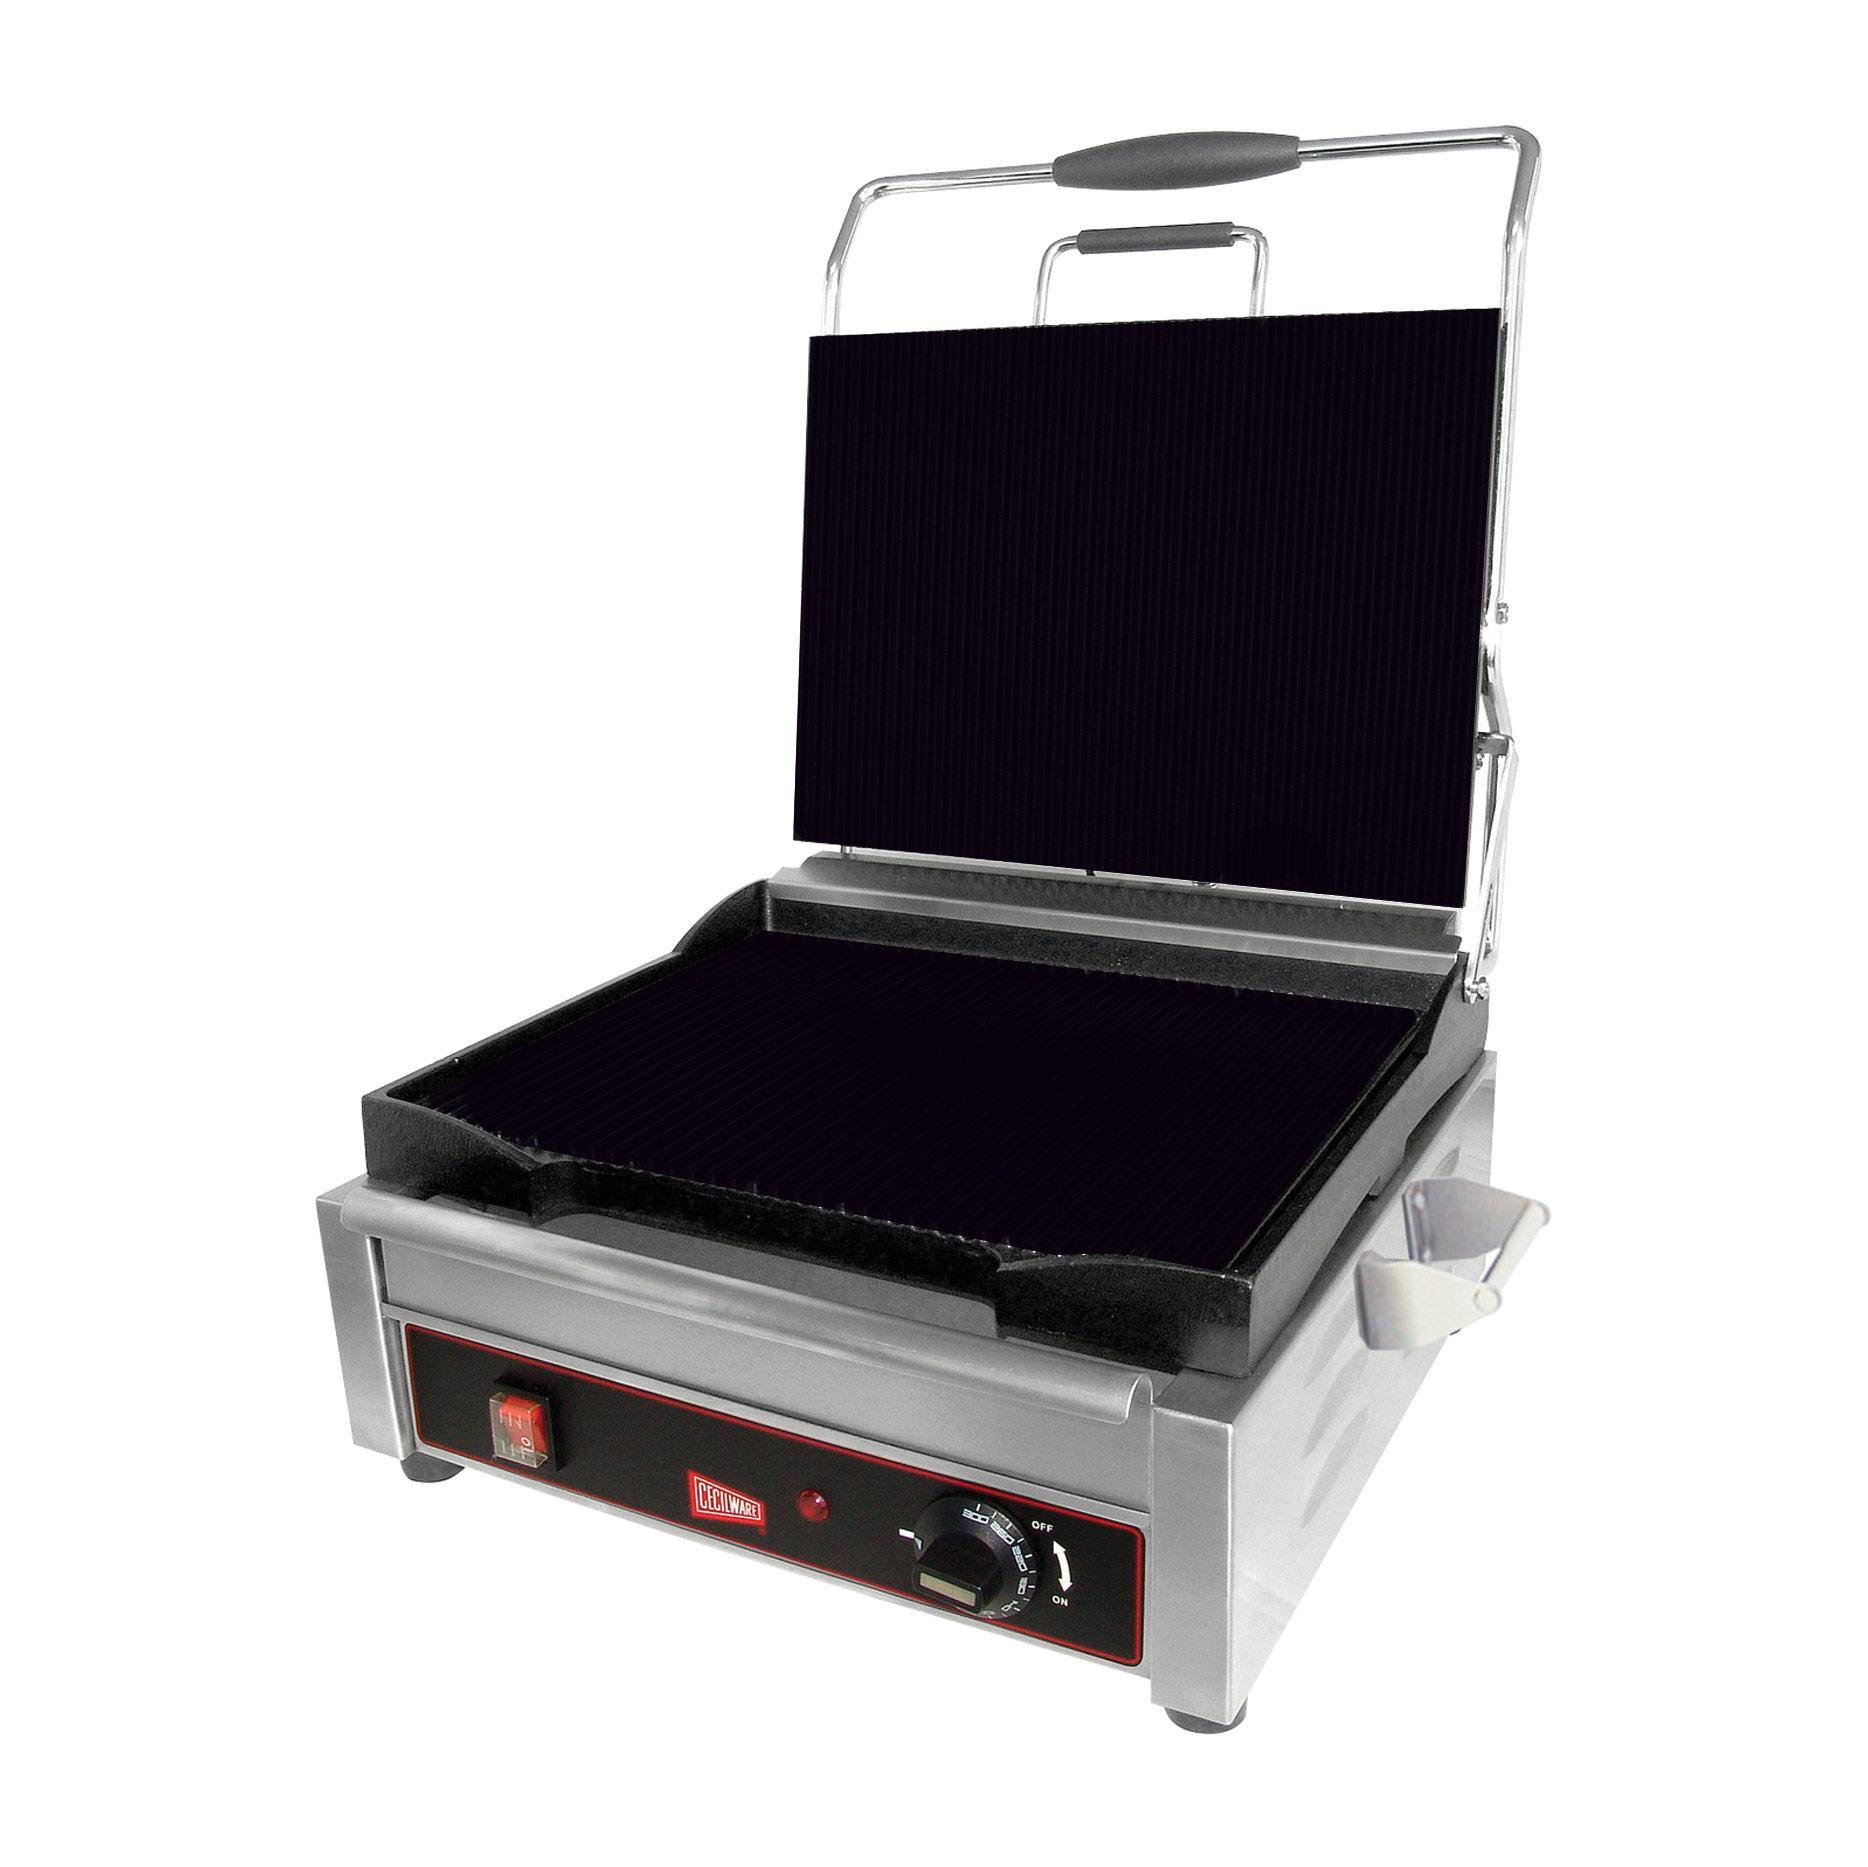 Grindmaster-Cecilware SG1SF sandwich / panini grill